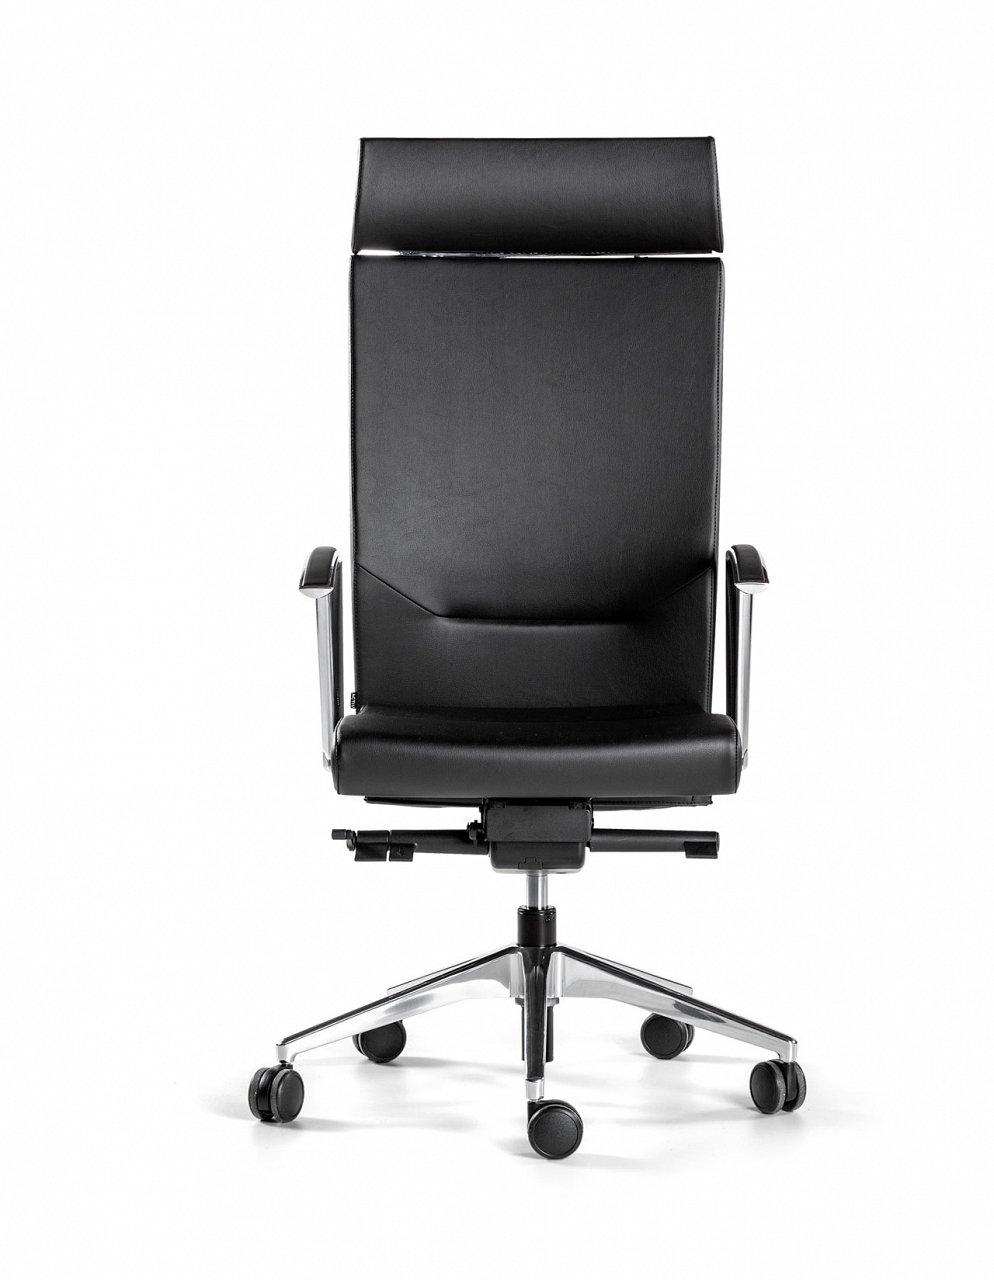 Kados Office Chair from Actiu